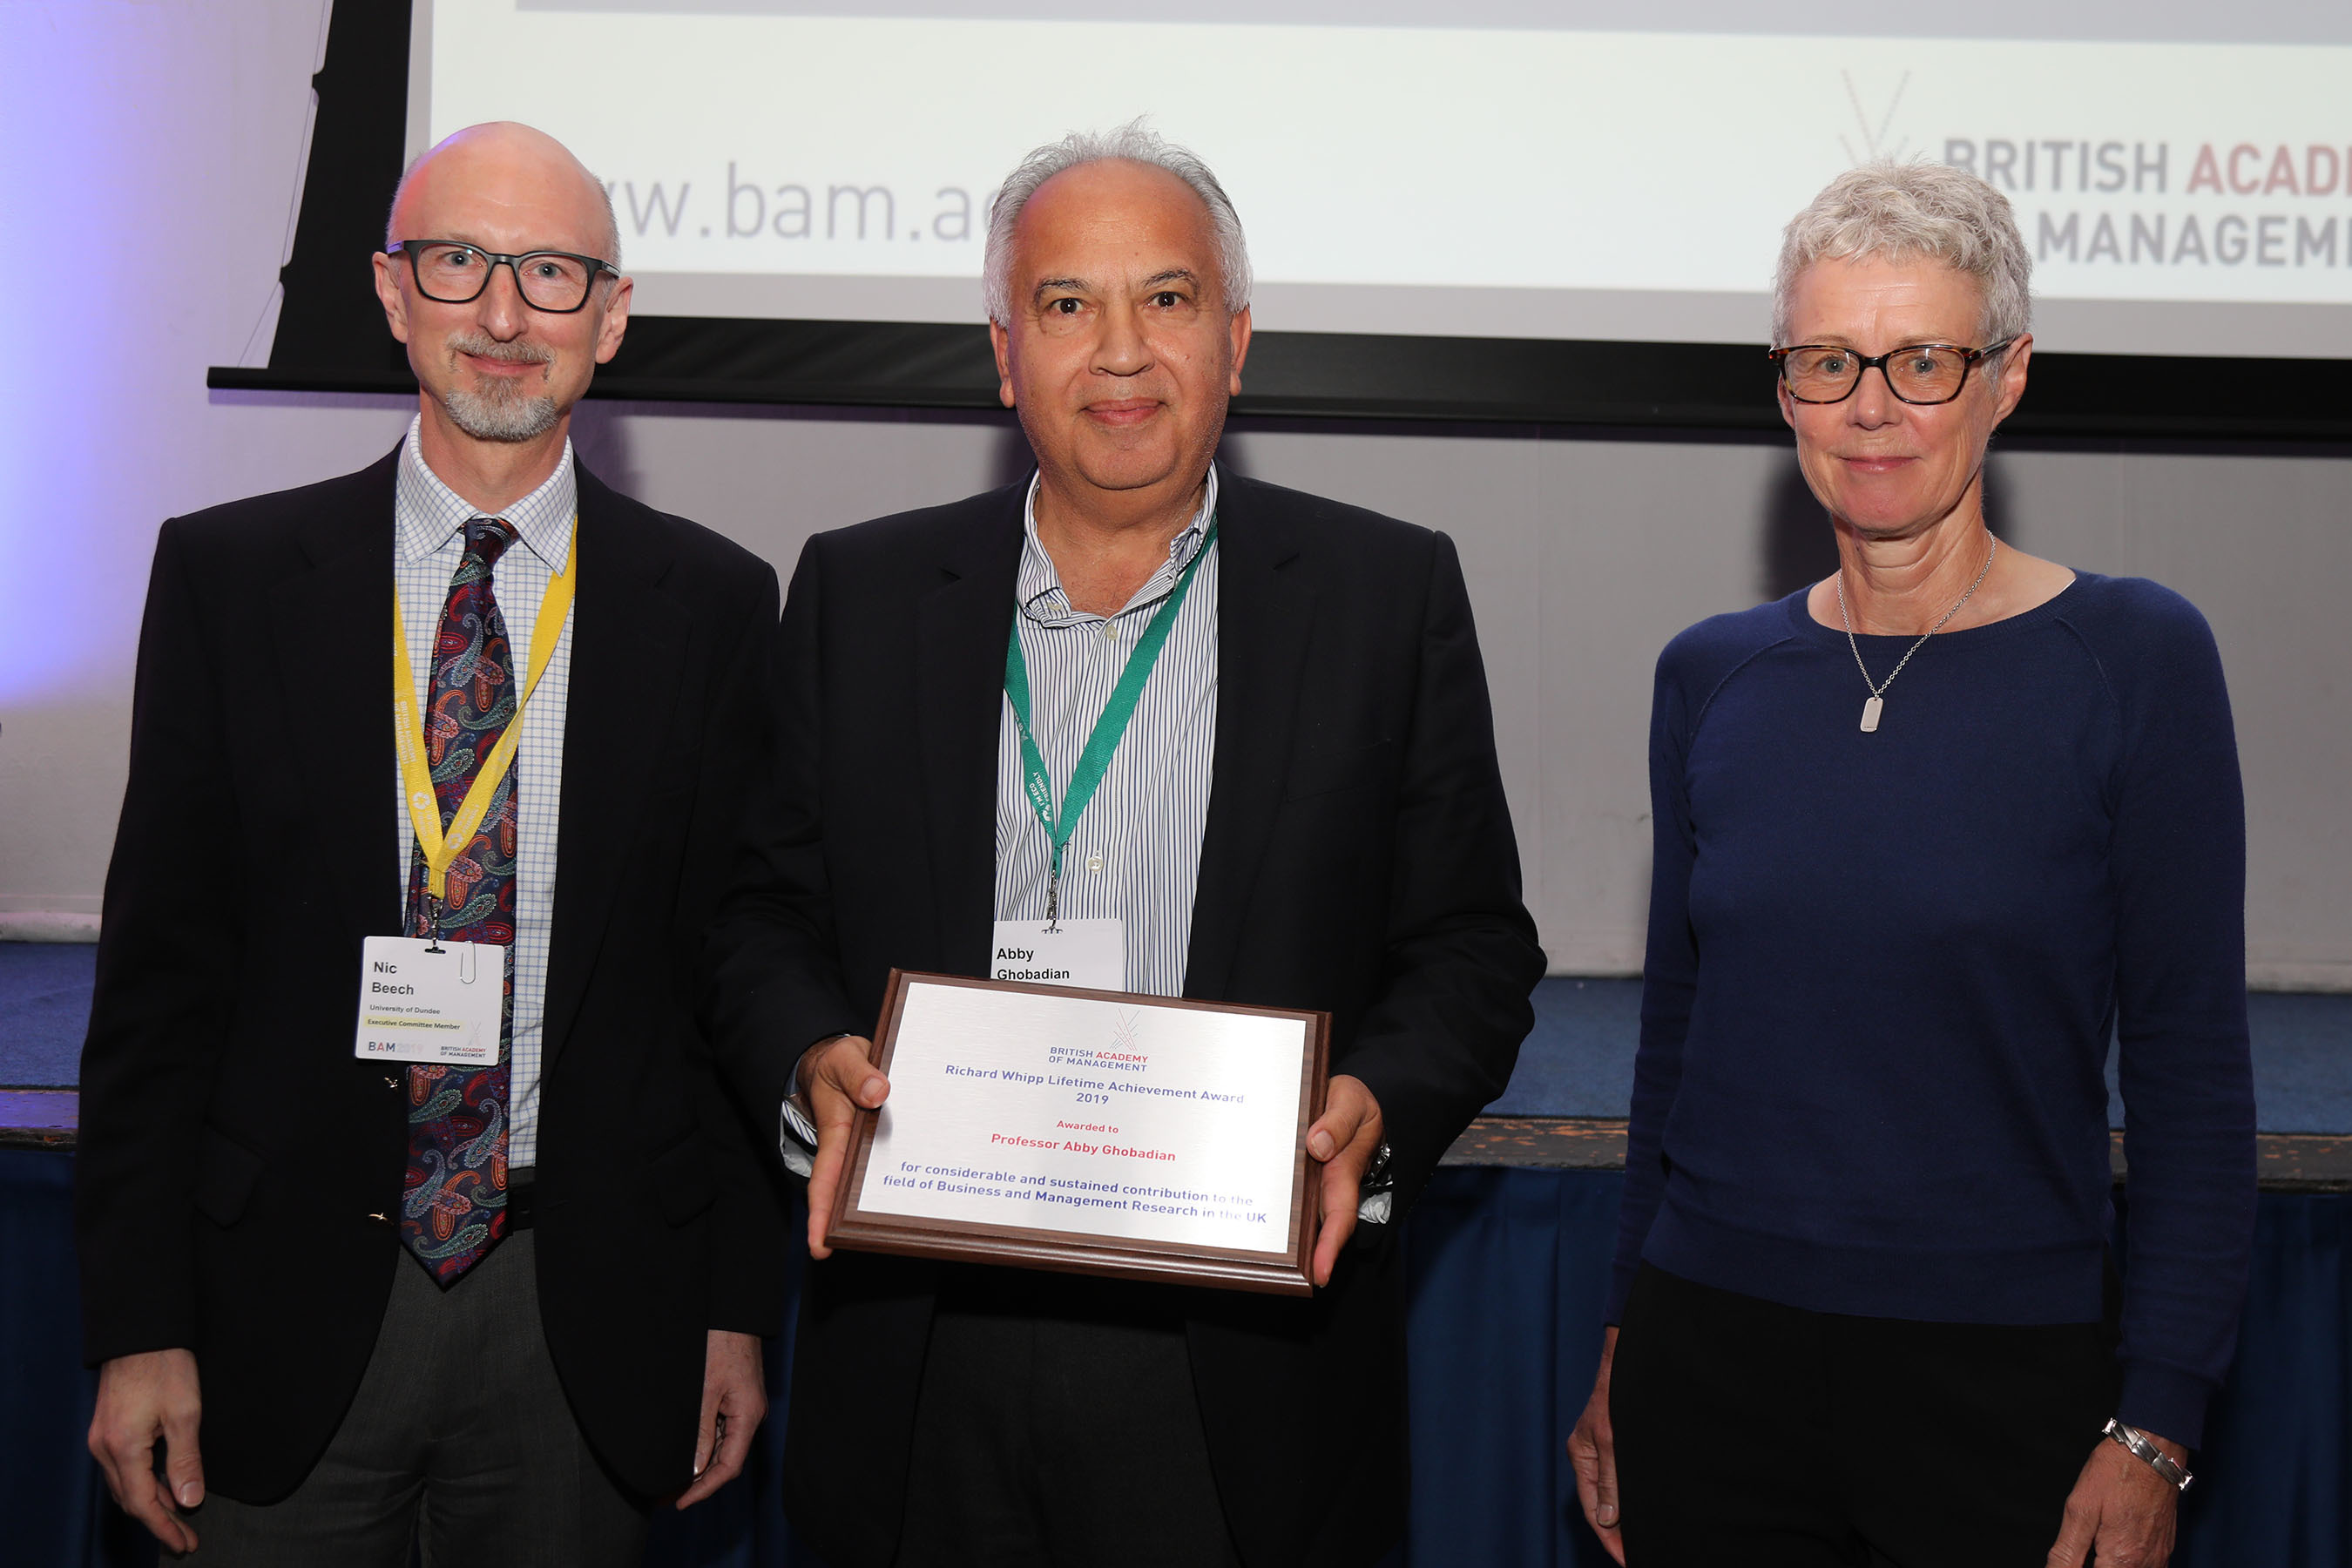 Henley professor receives British Academy of Management Lifetime Achievement Award